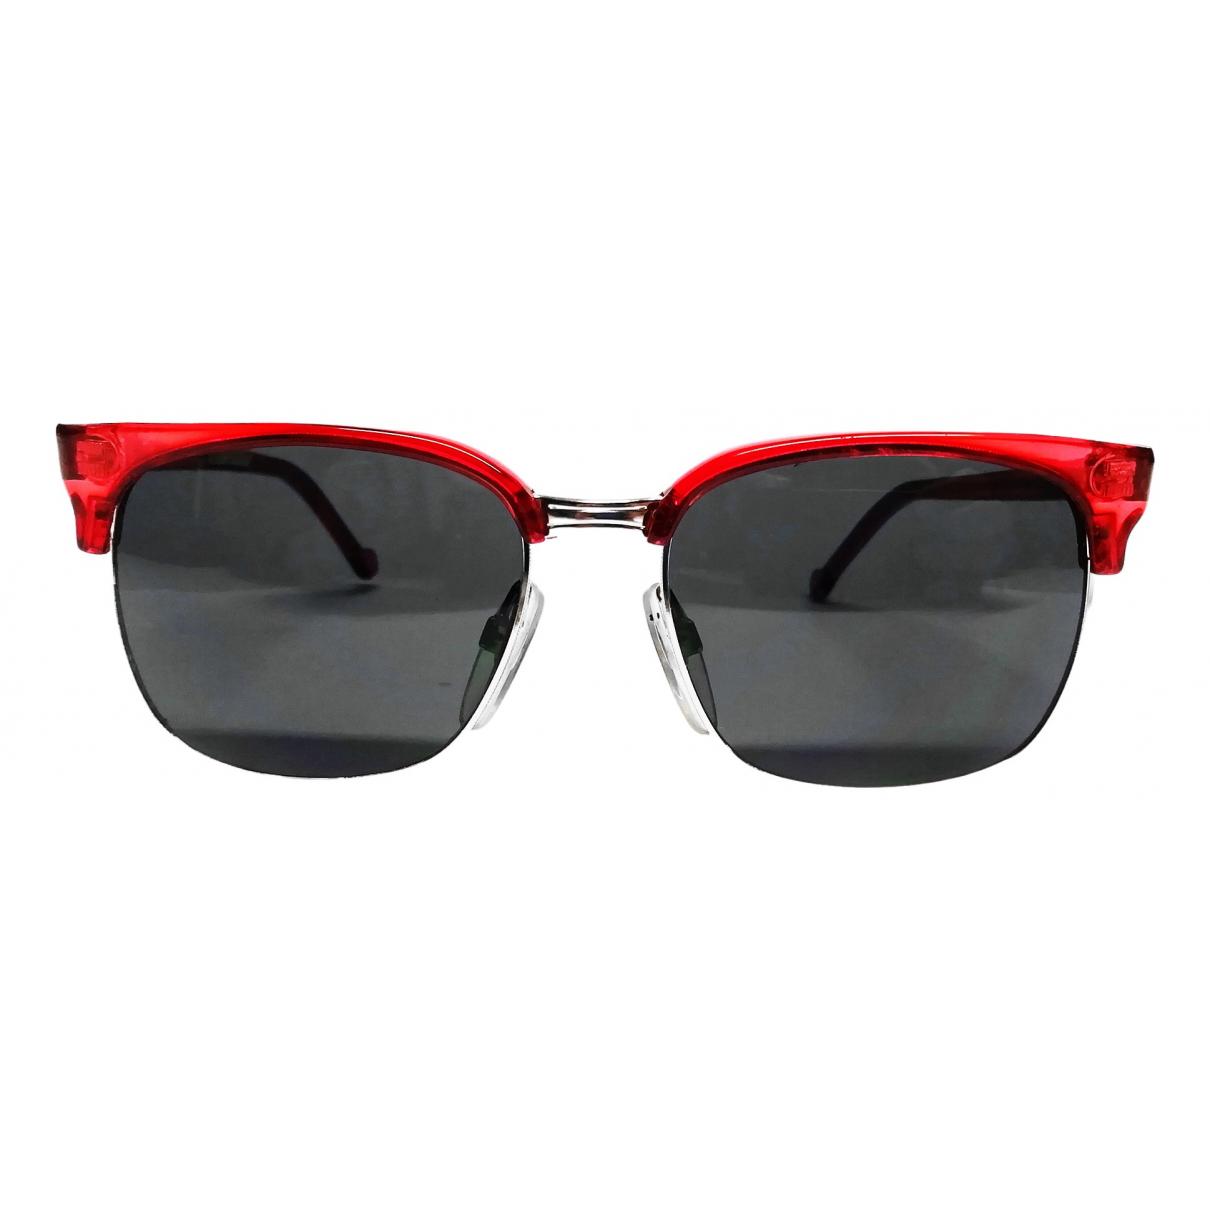 Fiorucci N Red Sunglasses for Women N